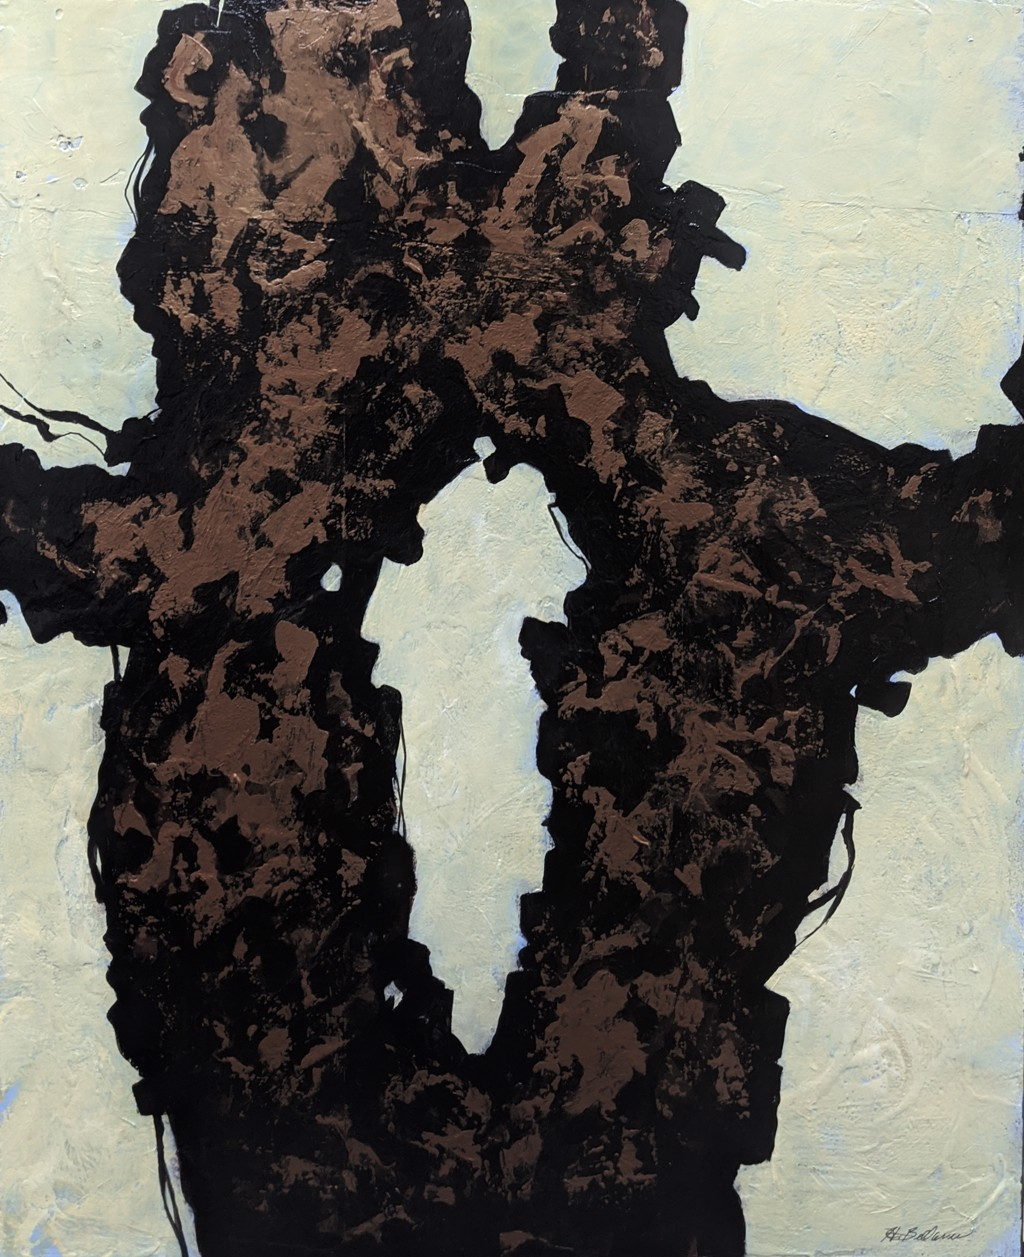 Renegade Heart by Helen Bellaver